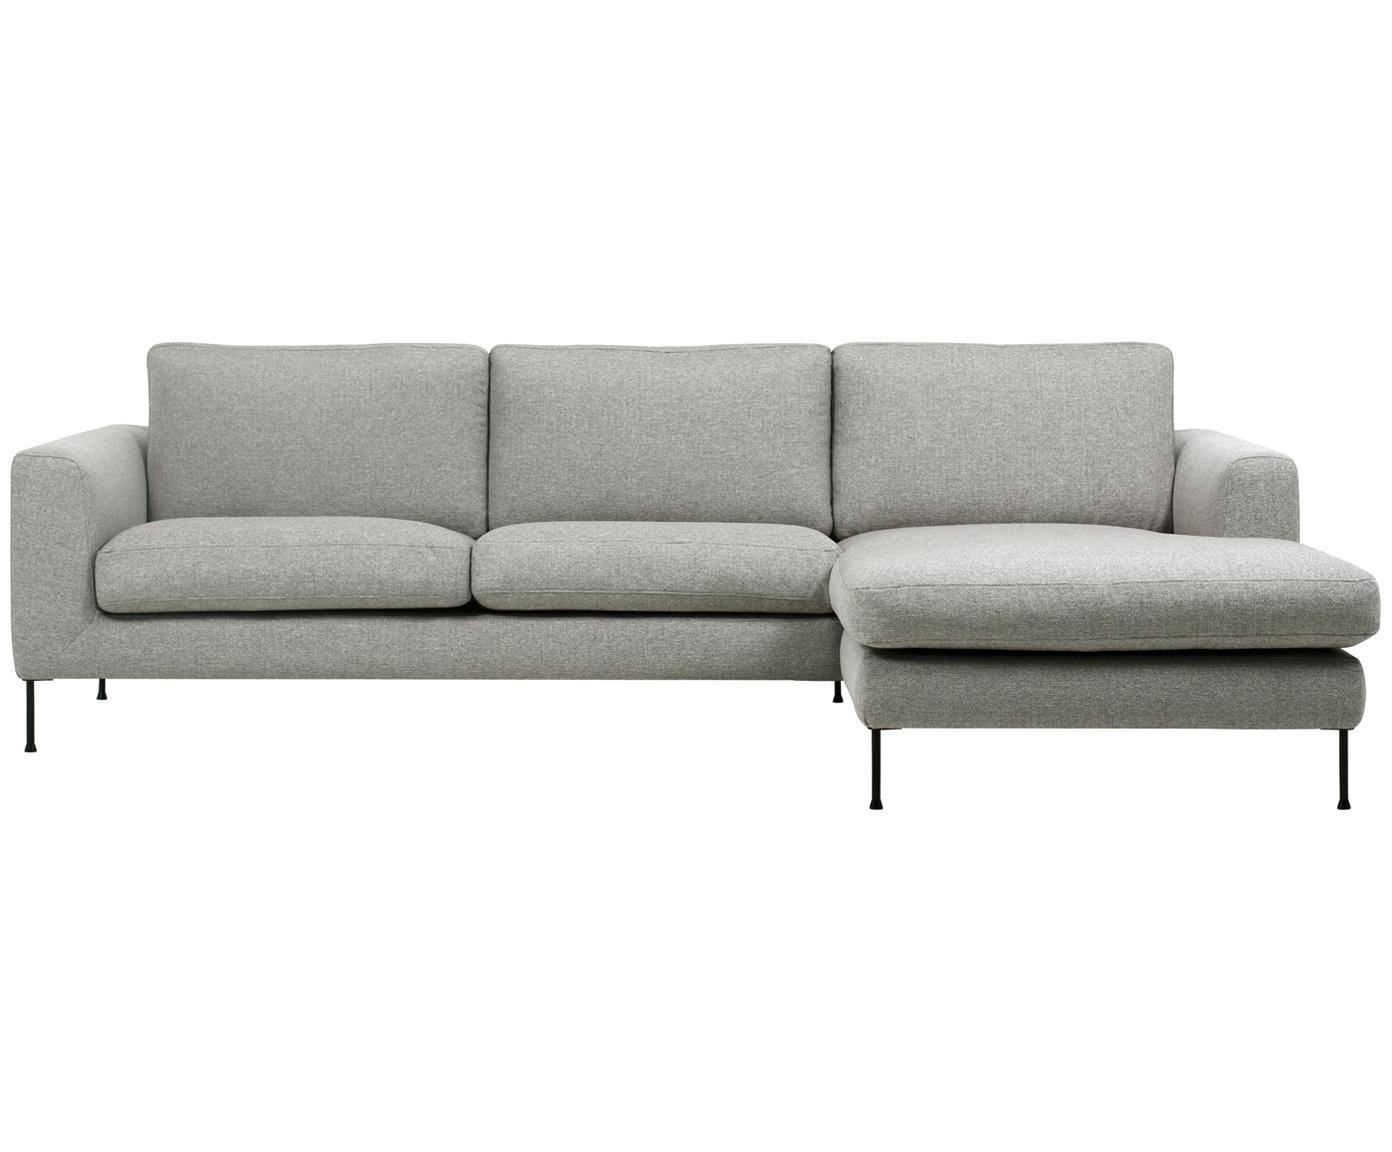 Ecksofa Cucita (3-Sitzer), Bezug: Webstoff (Polyester) 45.0, Gestell: Massives Kiefernholz, Webstoff Hellgrau, B 262 x T 163 cm